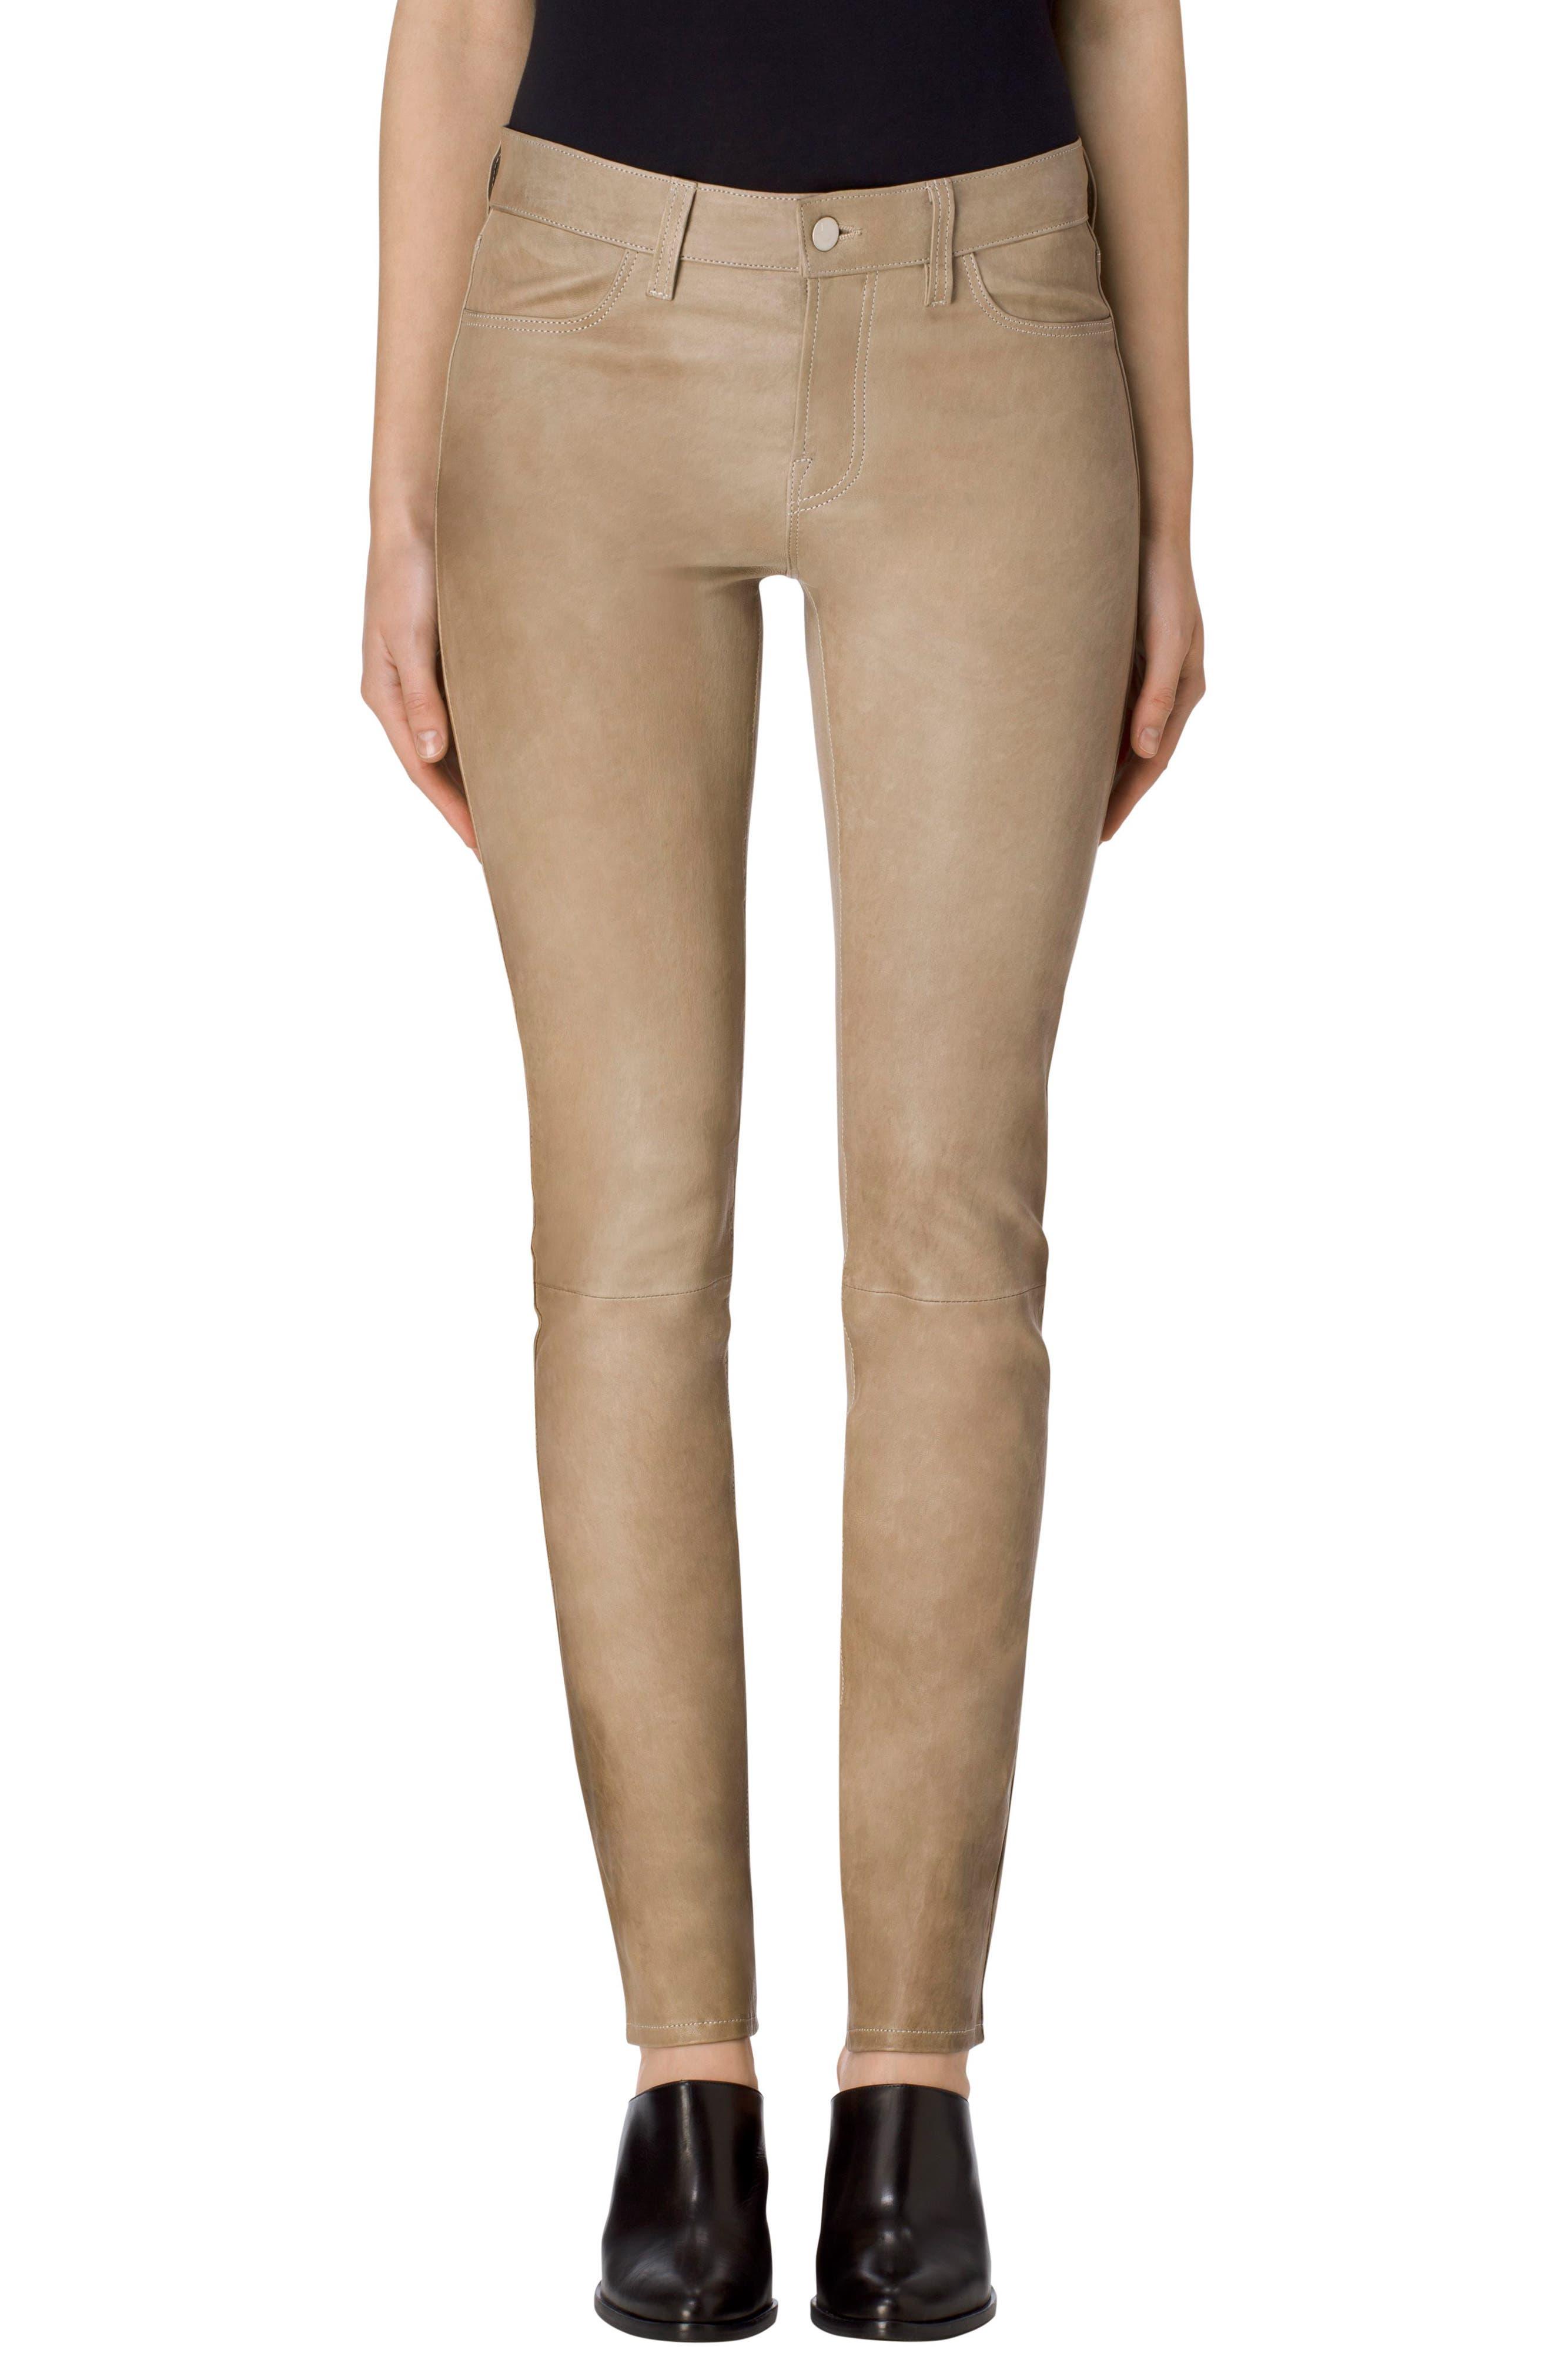 Alternate Image 1 Selected - J Brand Maude Leather Cigarette Pants